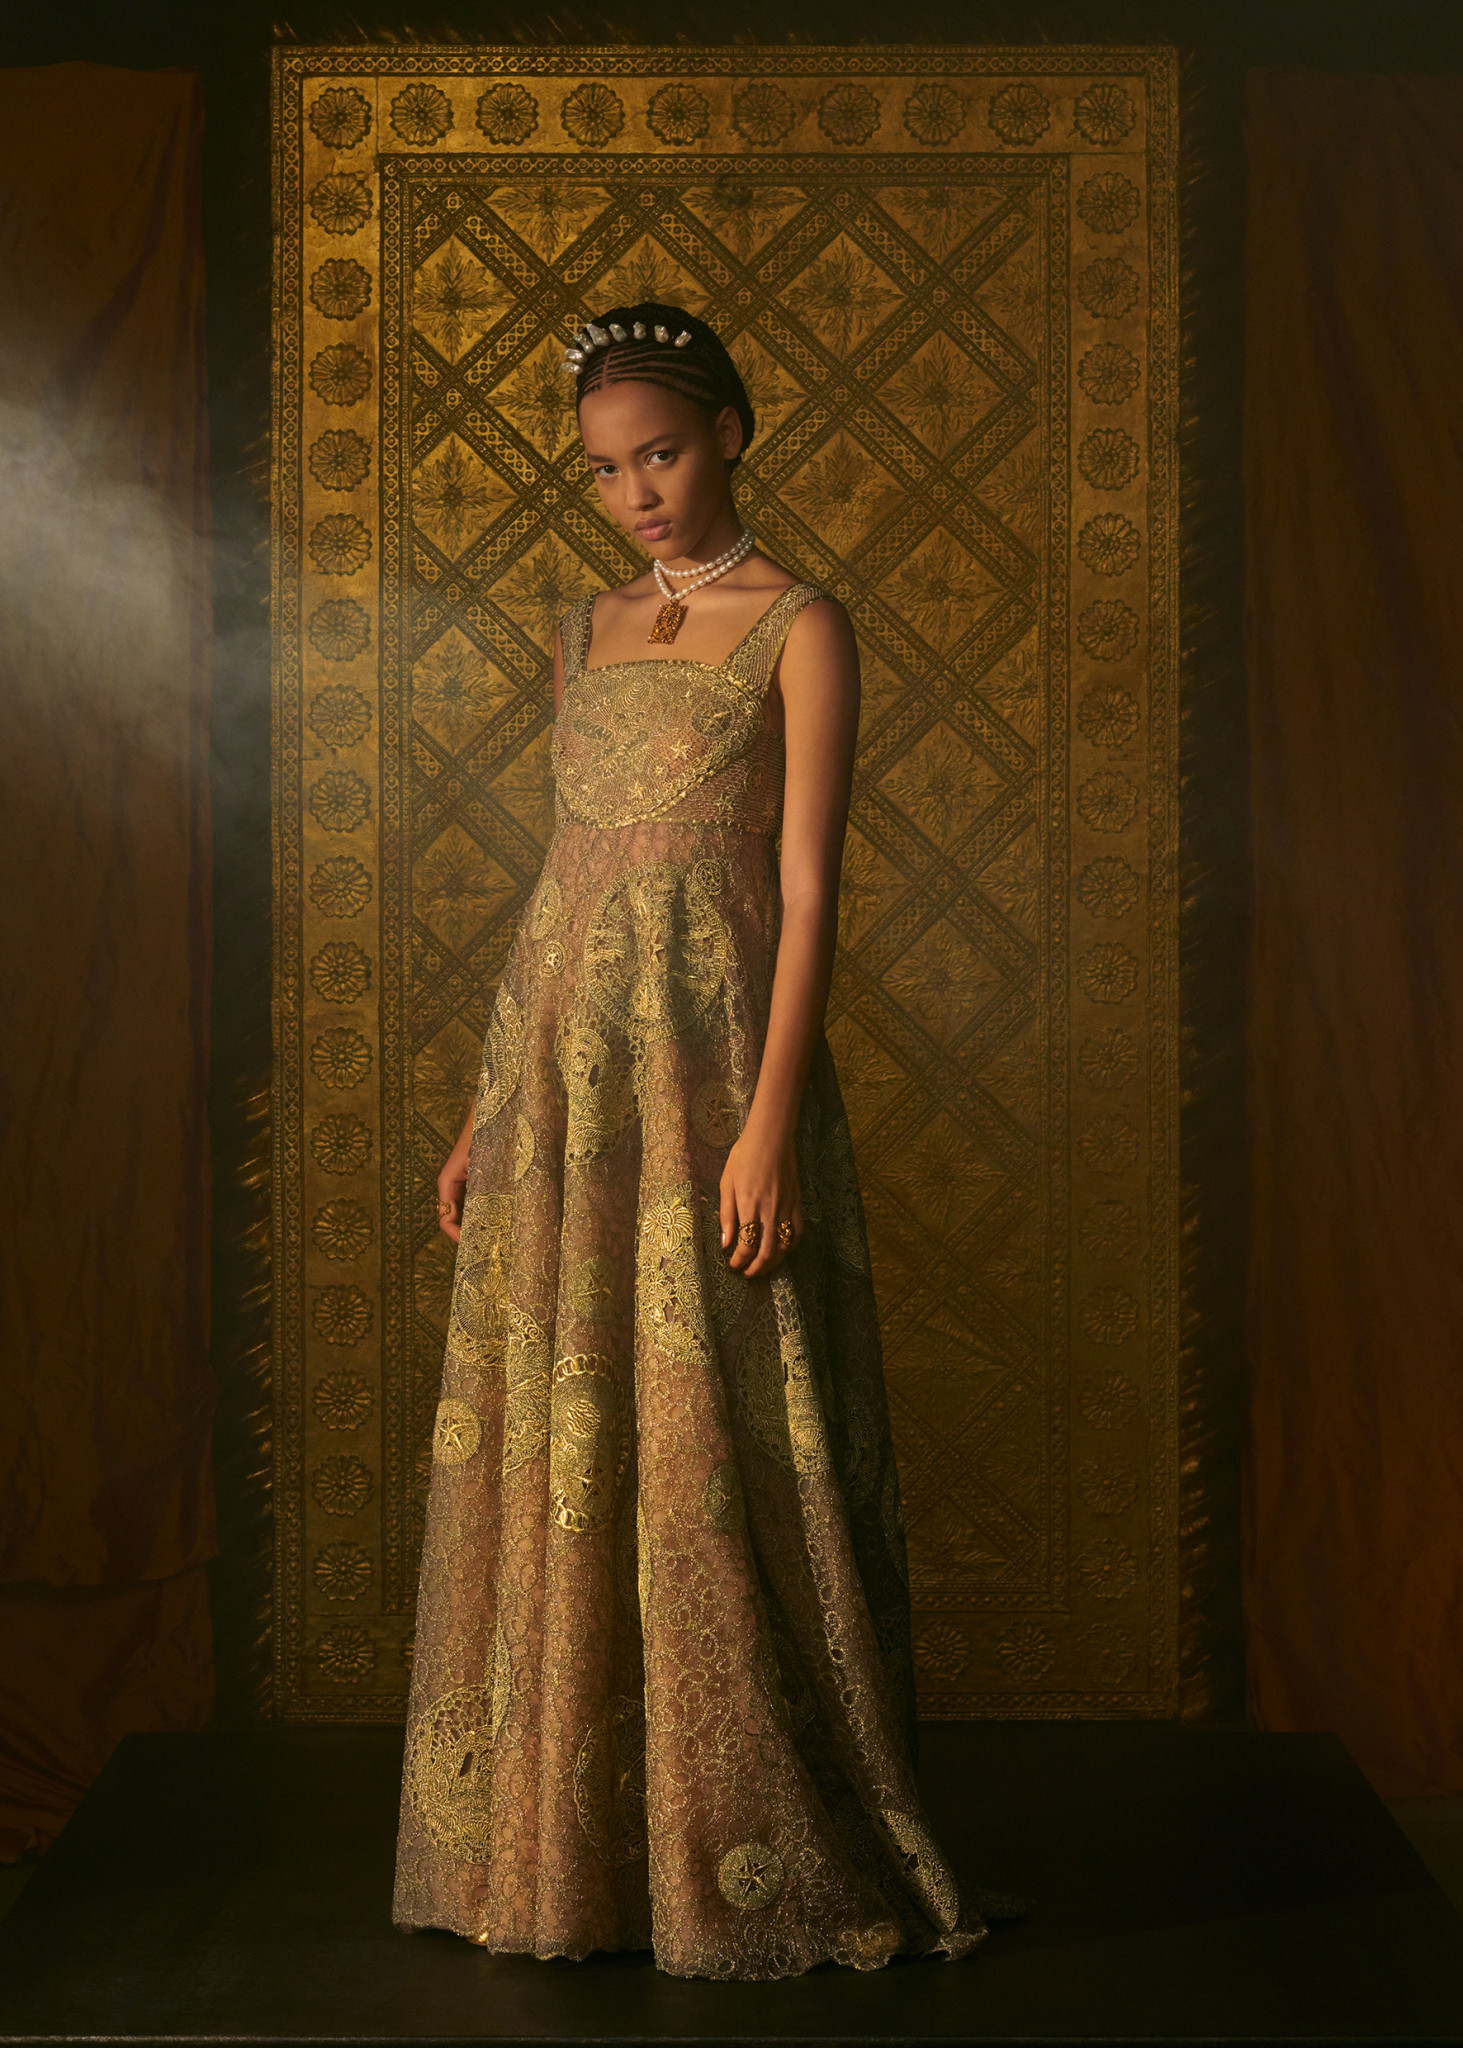 Dior Couture SS21 by Elina Kechicheva